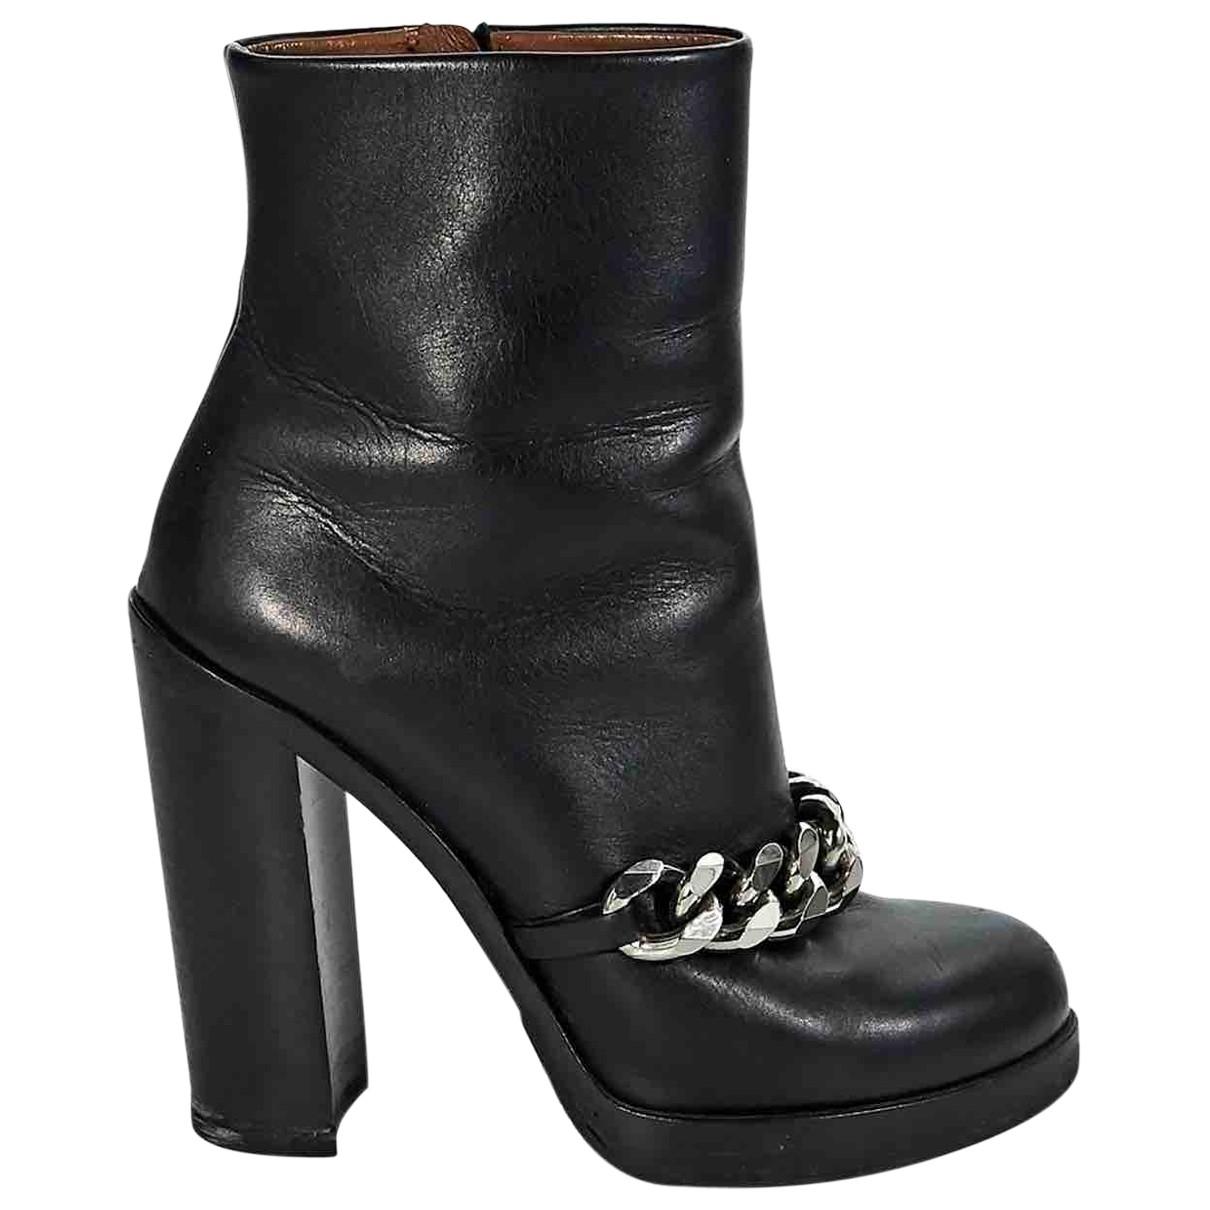 Botas moteras de Cuero Givenchy